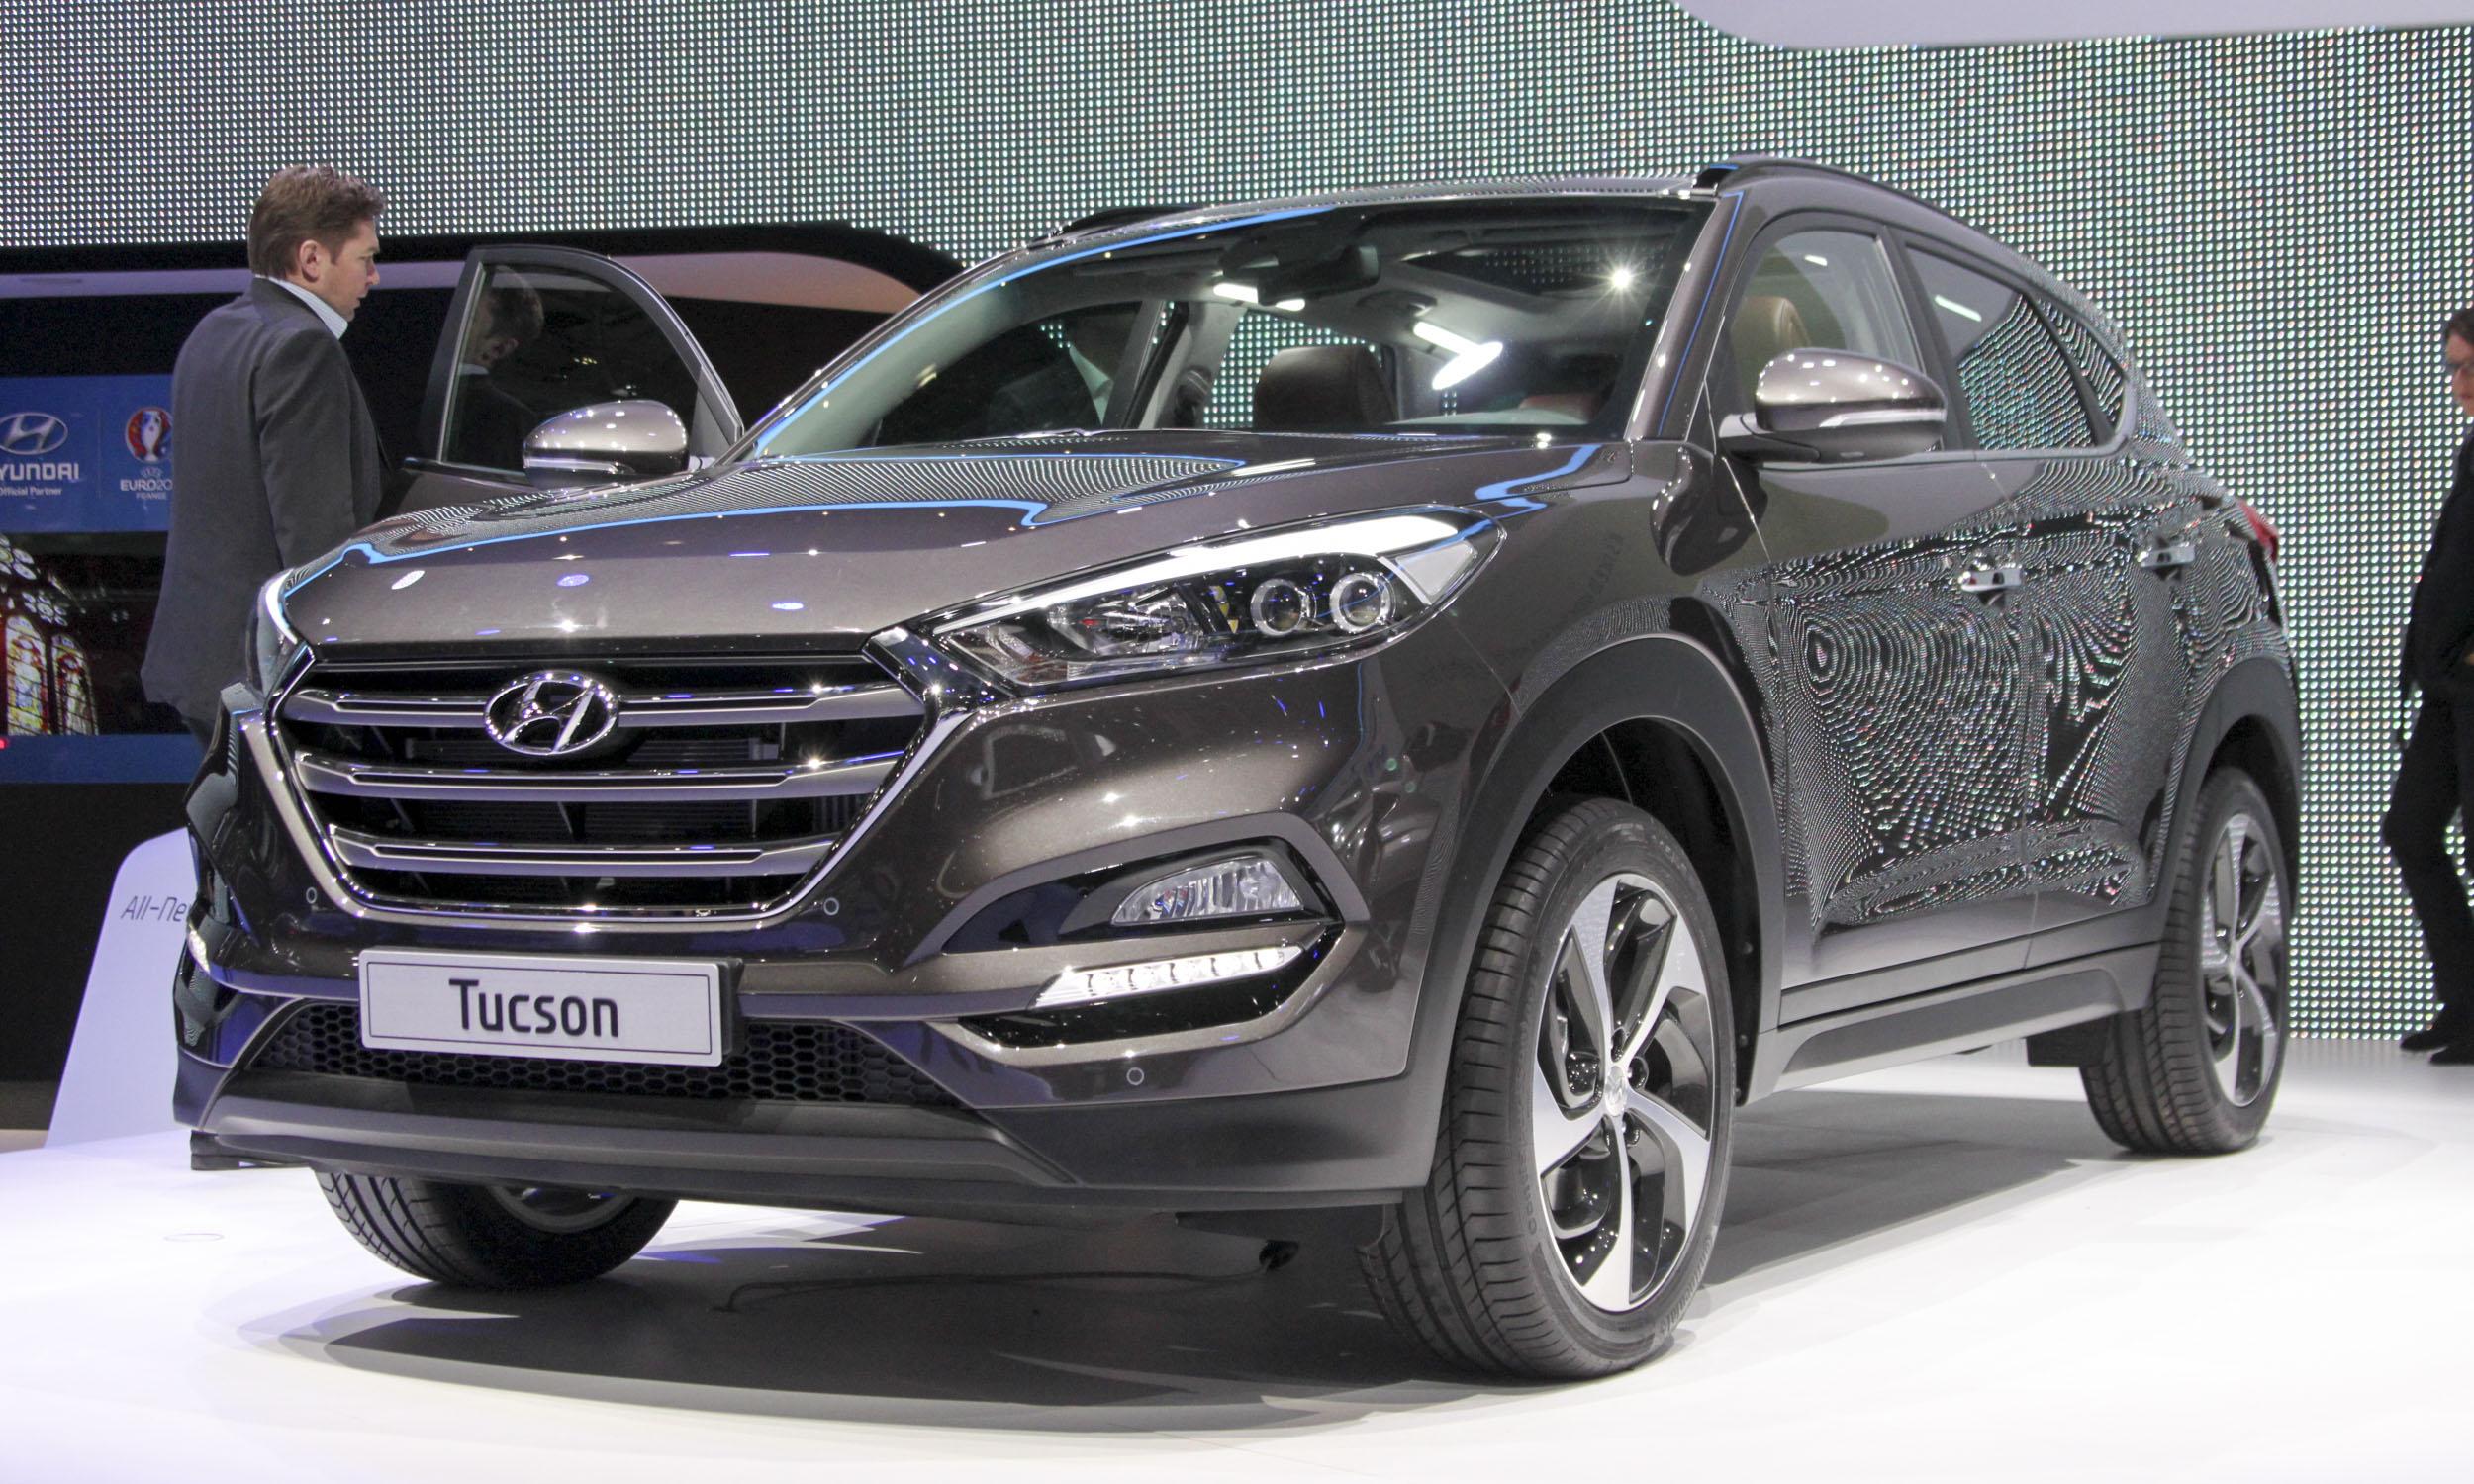 prepped Hyundai Tucson Adventuremobile to arrive at 2015 SEMA  Tuned